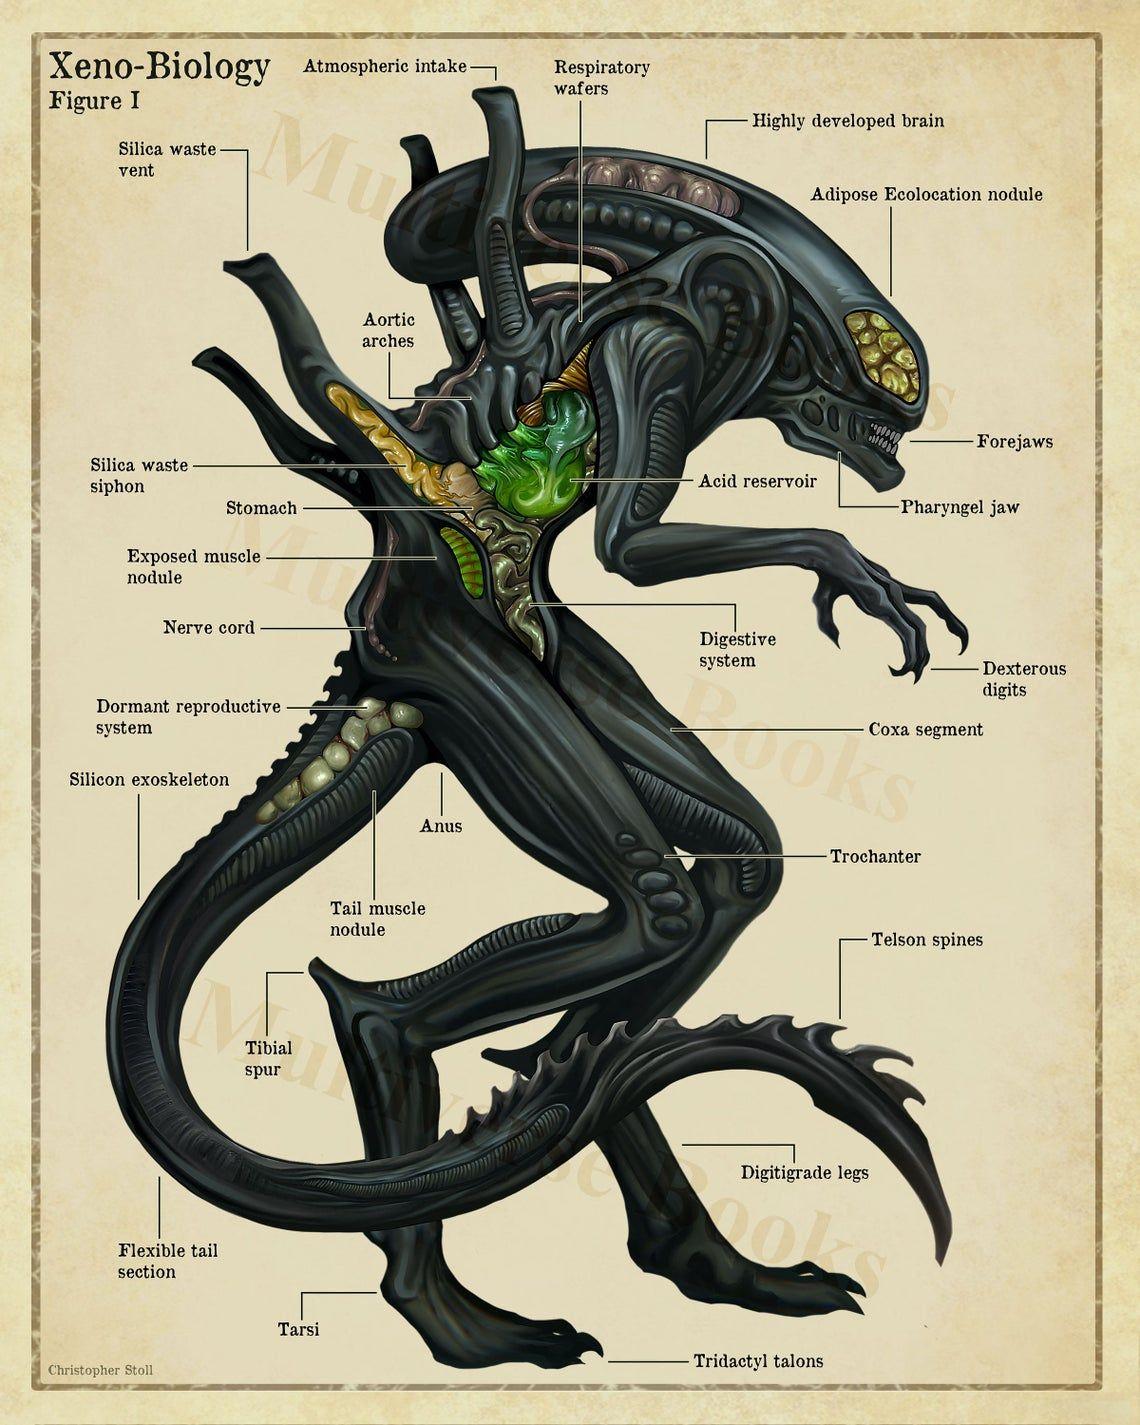 Xenomorph Anatomy Poster Alien Inspired Scientific Wall Art Etsy Aliens Movie Art Xenomorph Predator Alien Art